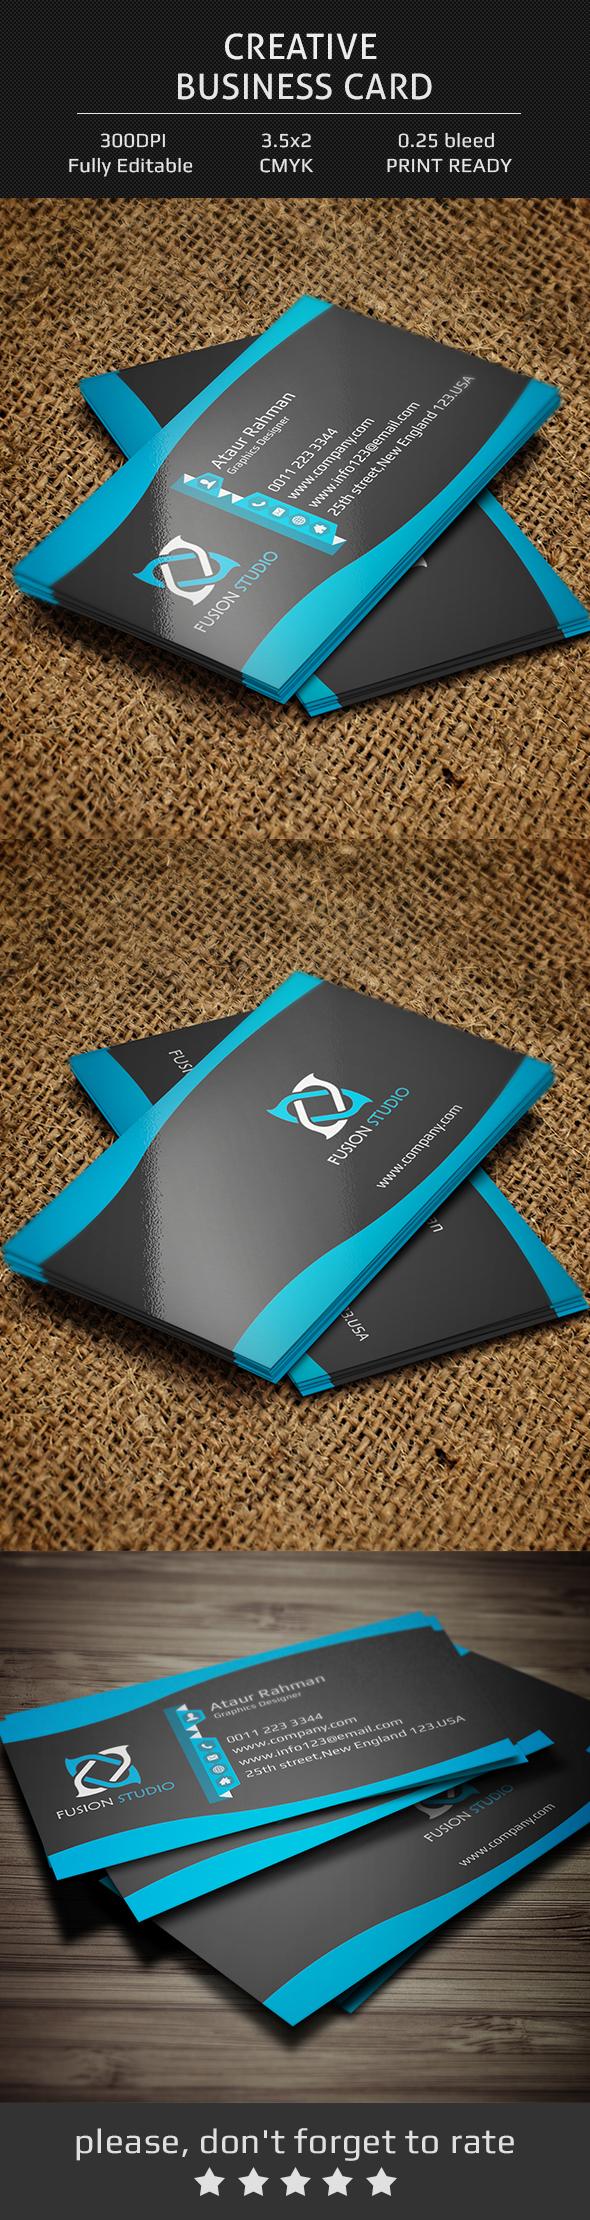 Beautiful business card company cool corporate creative designer modern design personal Free Card freebie free download free business card